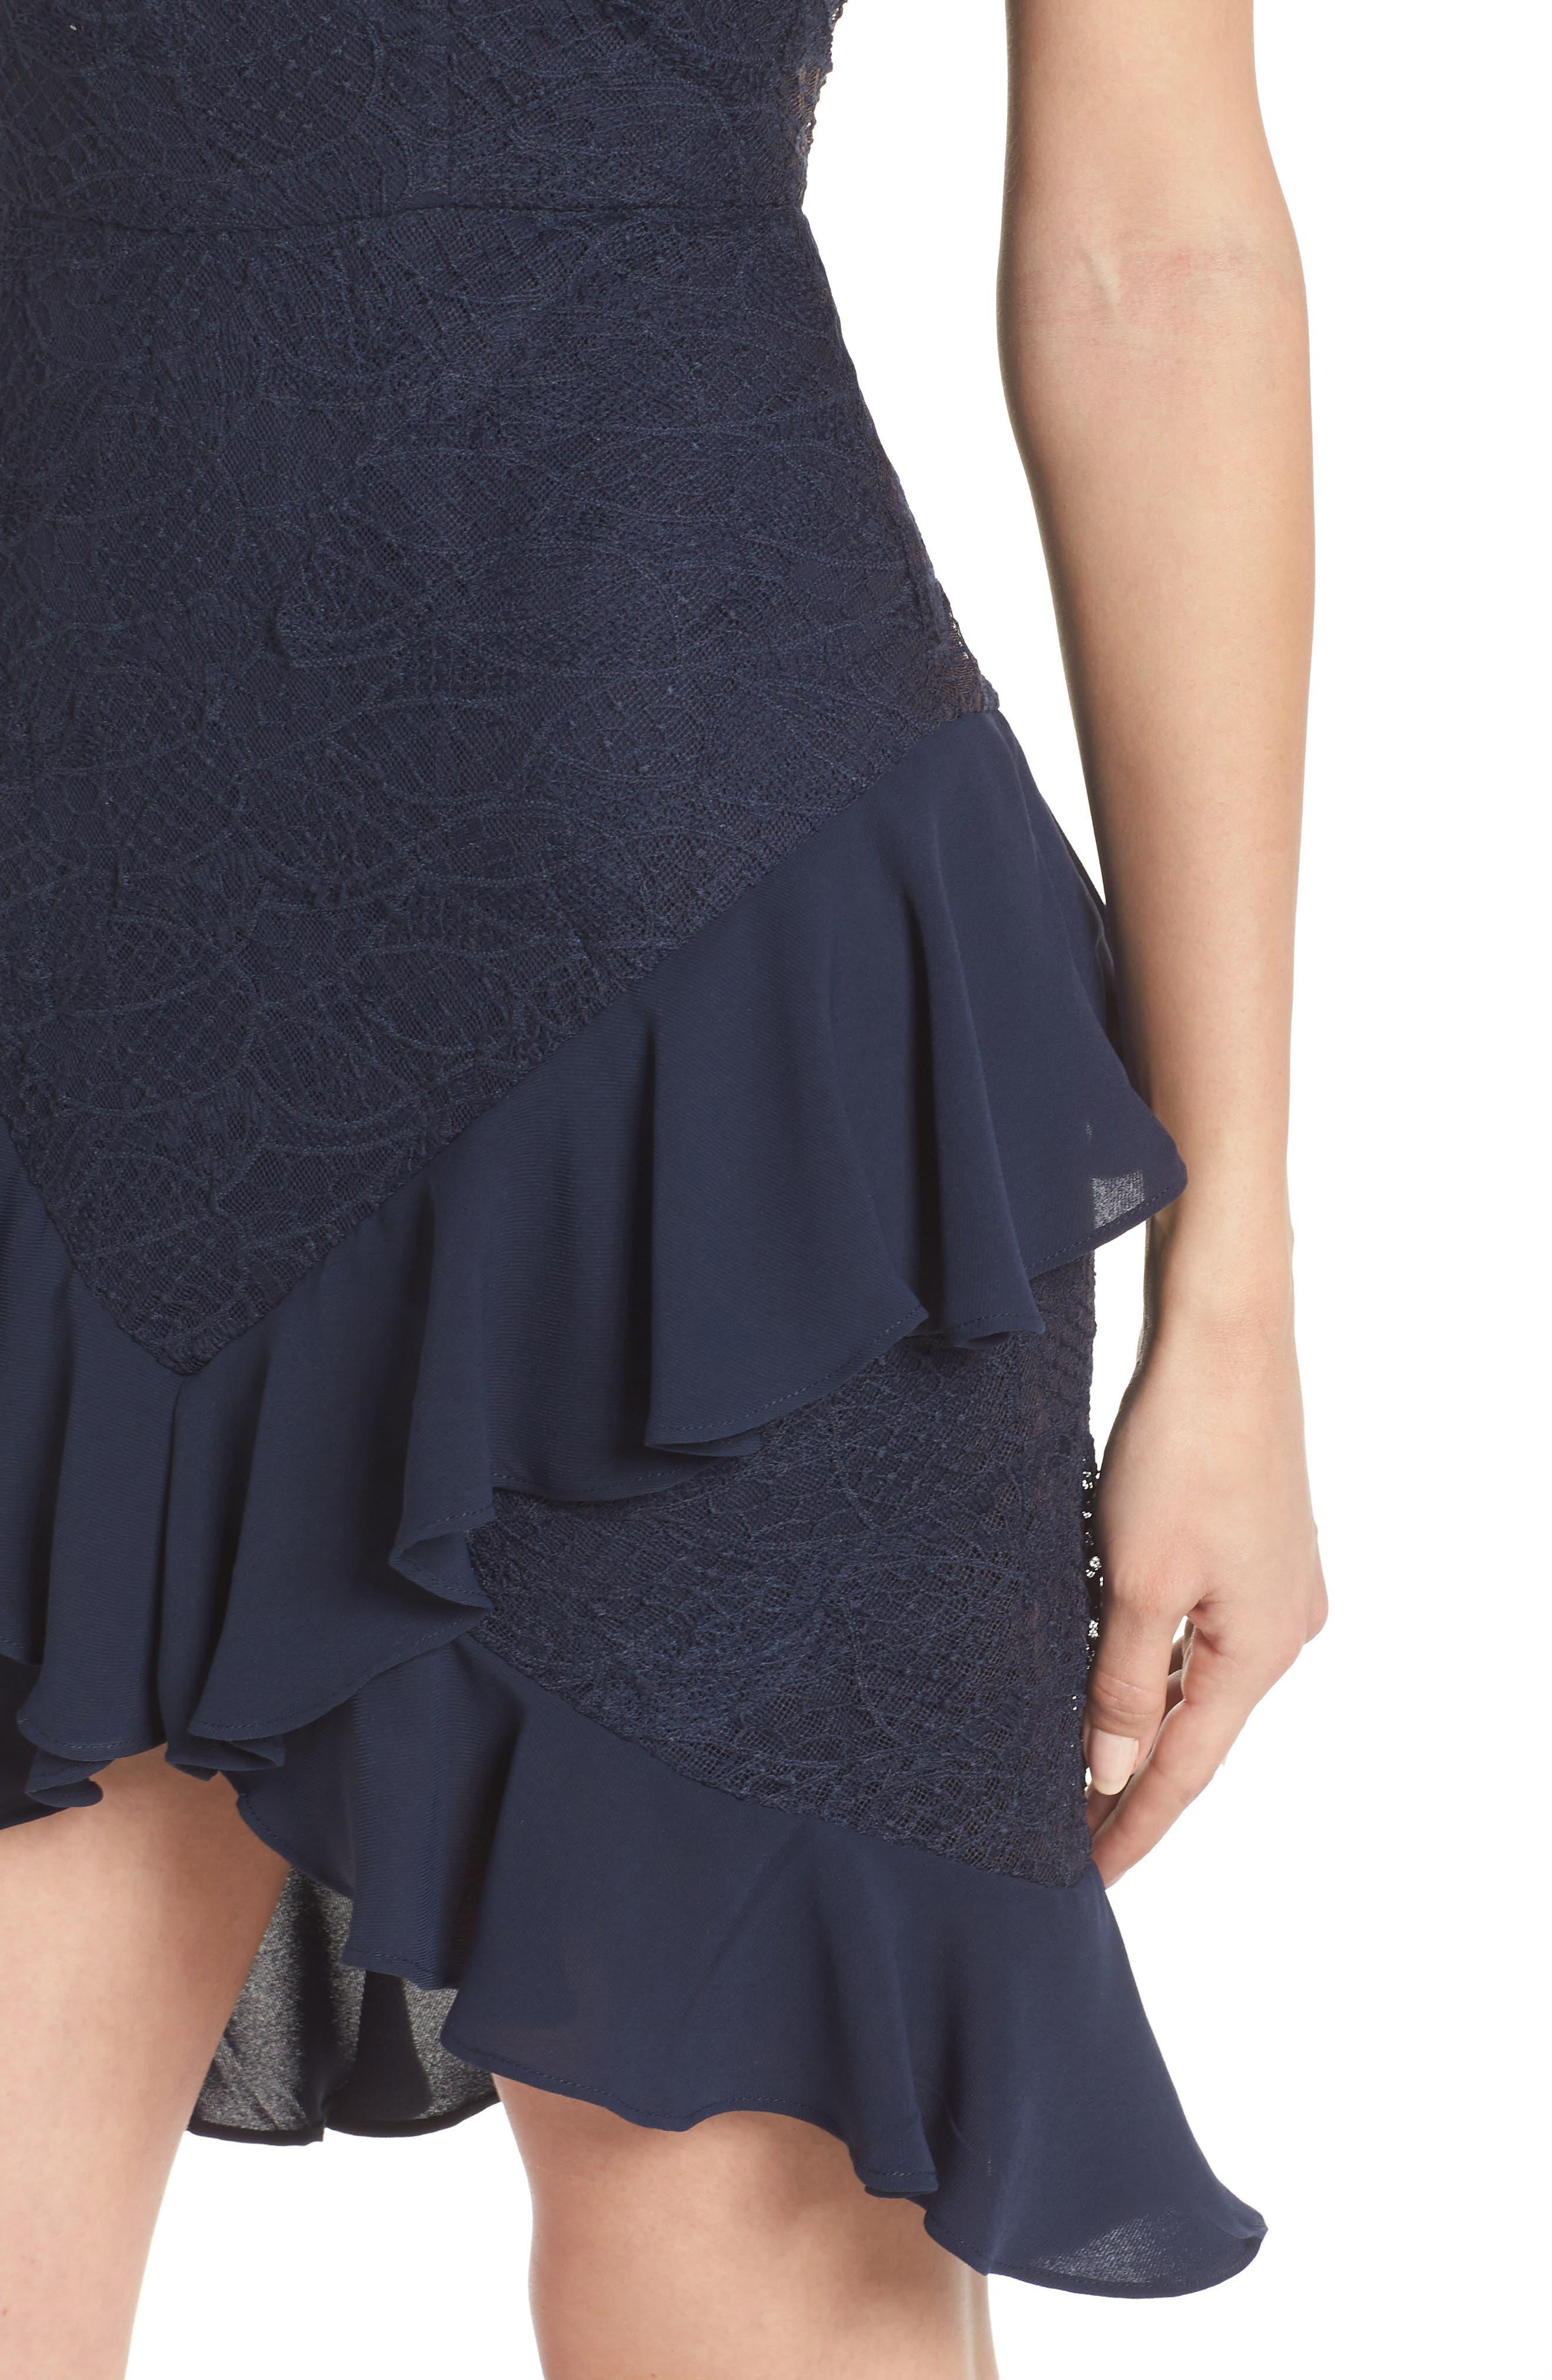 Amore Lace Minidress,                             Alternate thumbnail 4, color,                             450